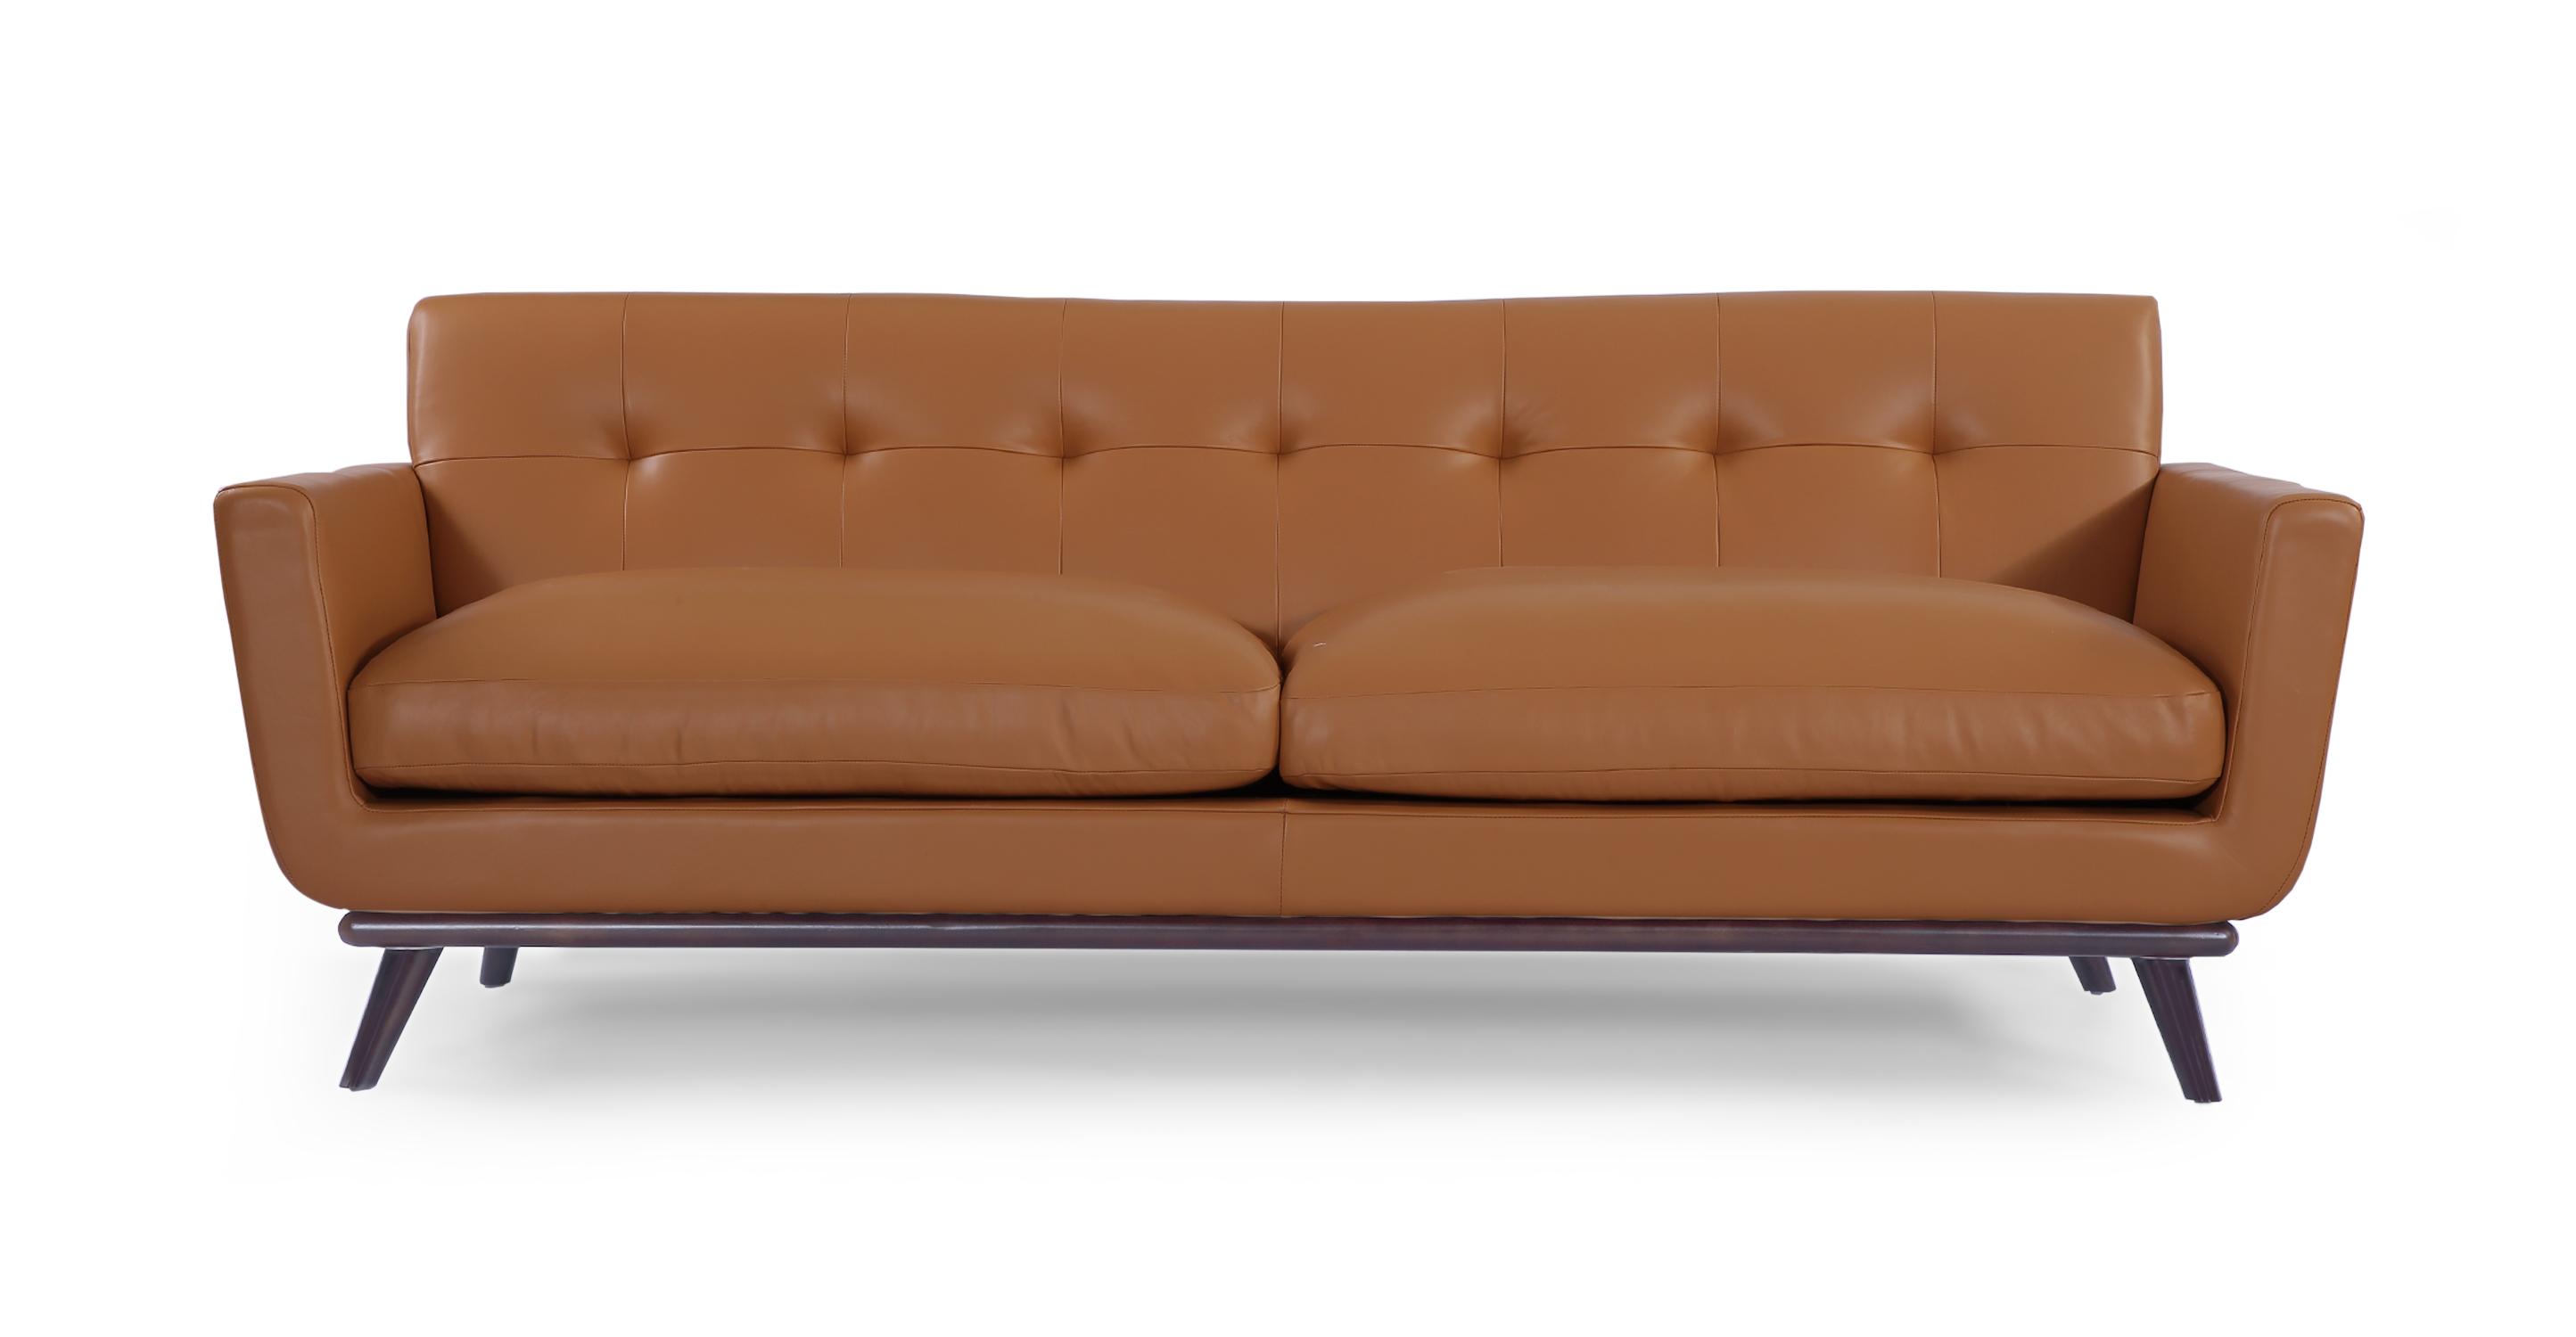 Jackie Mid Century Modern Classic Sofa Saddle Brown Aniline Leather EBay